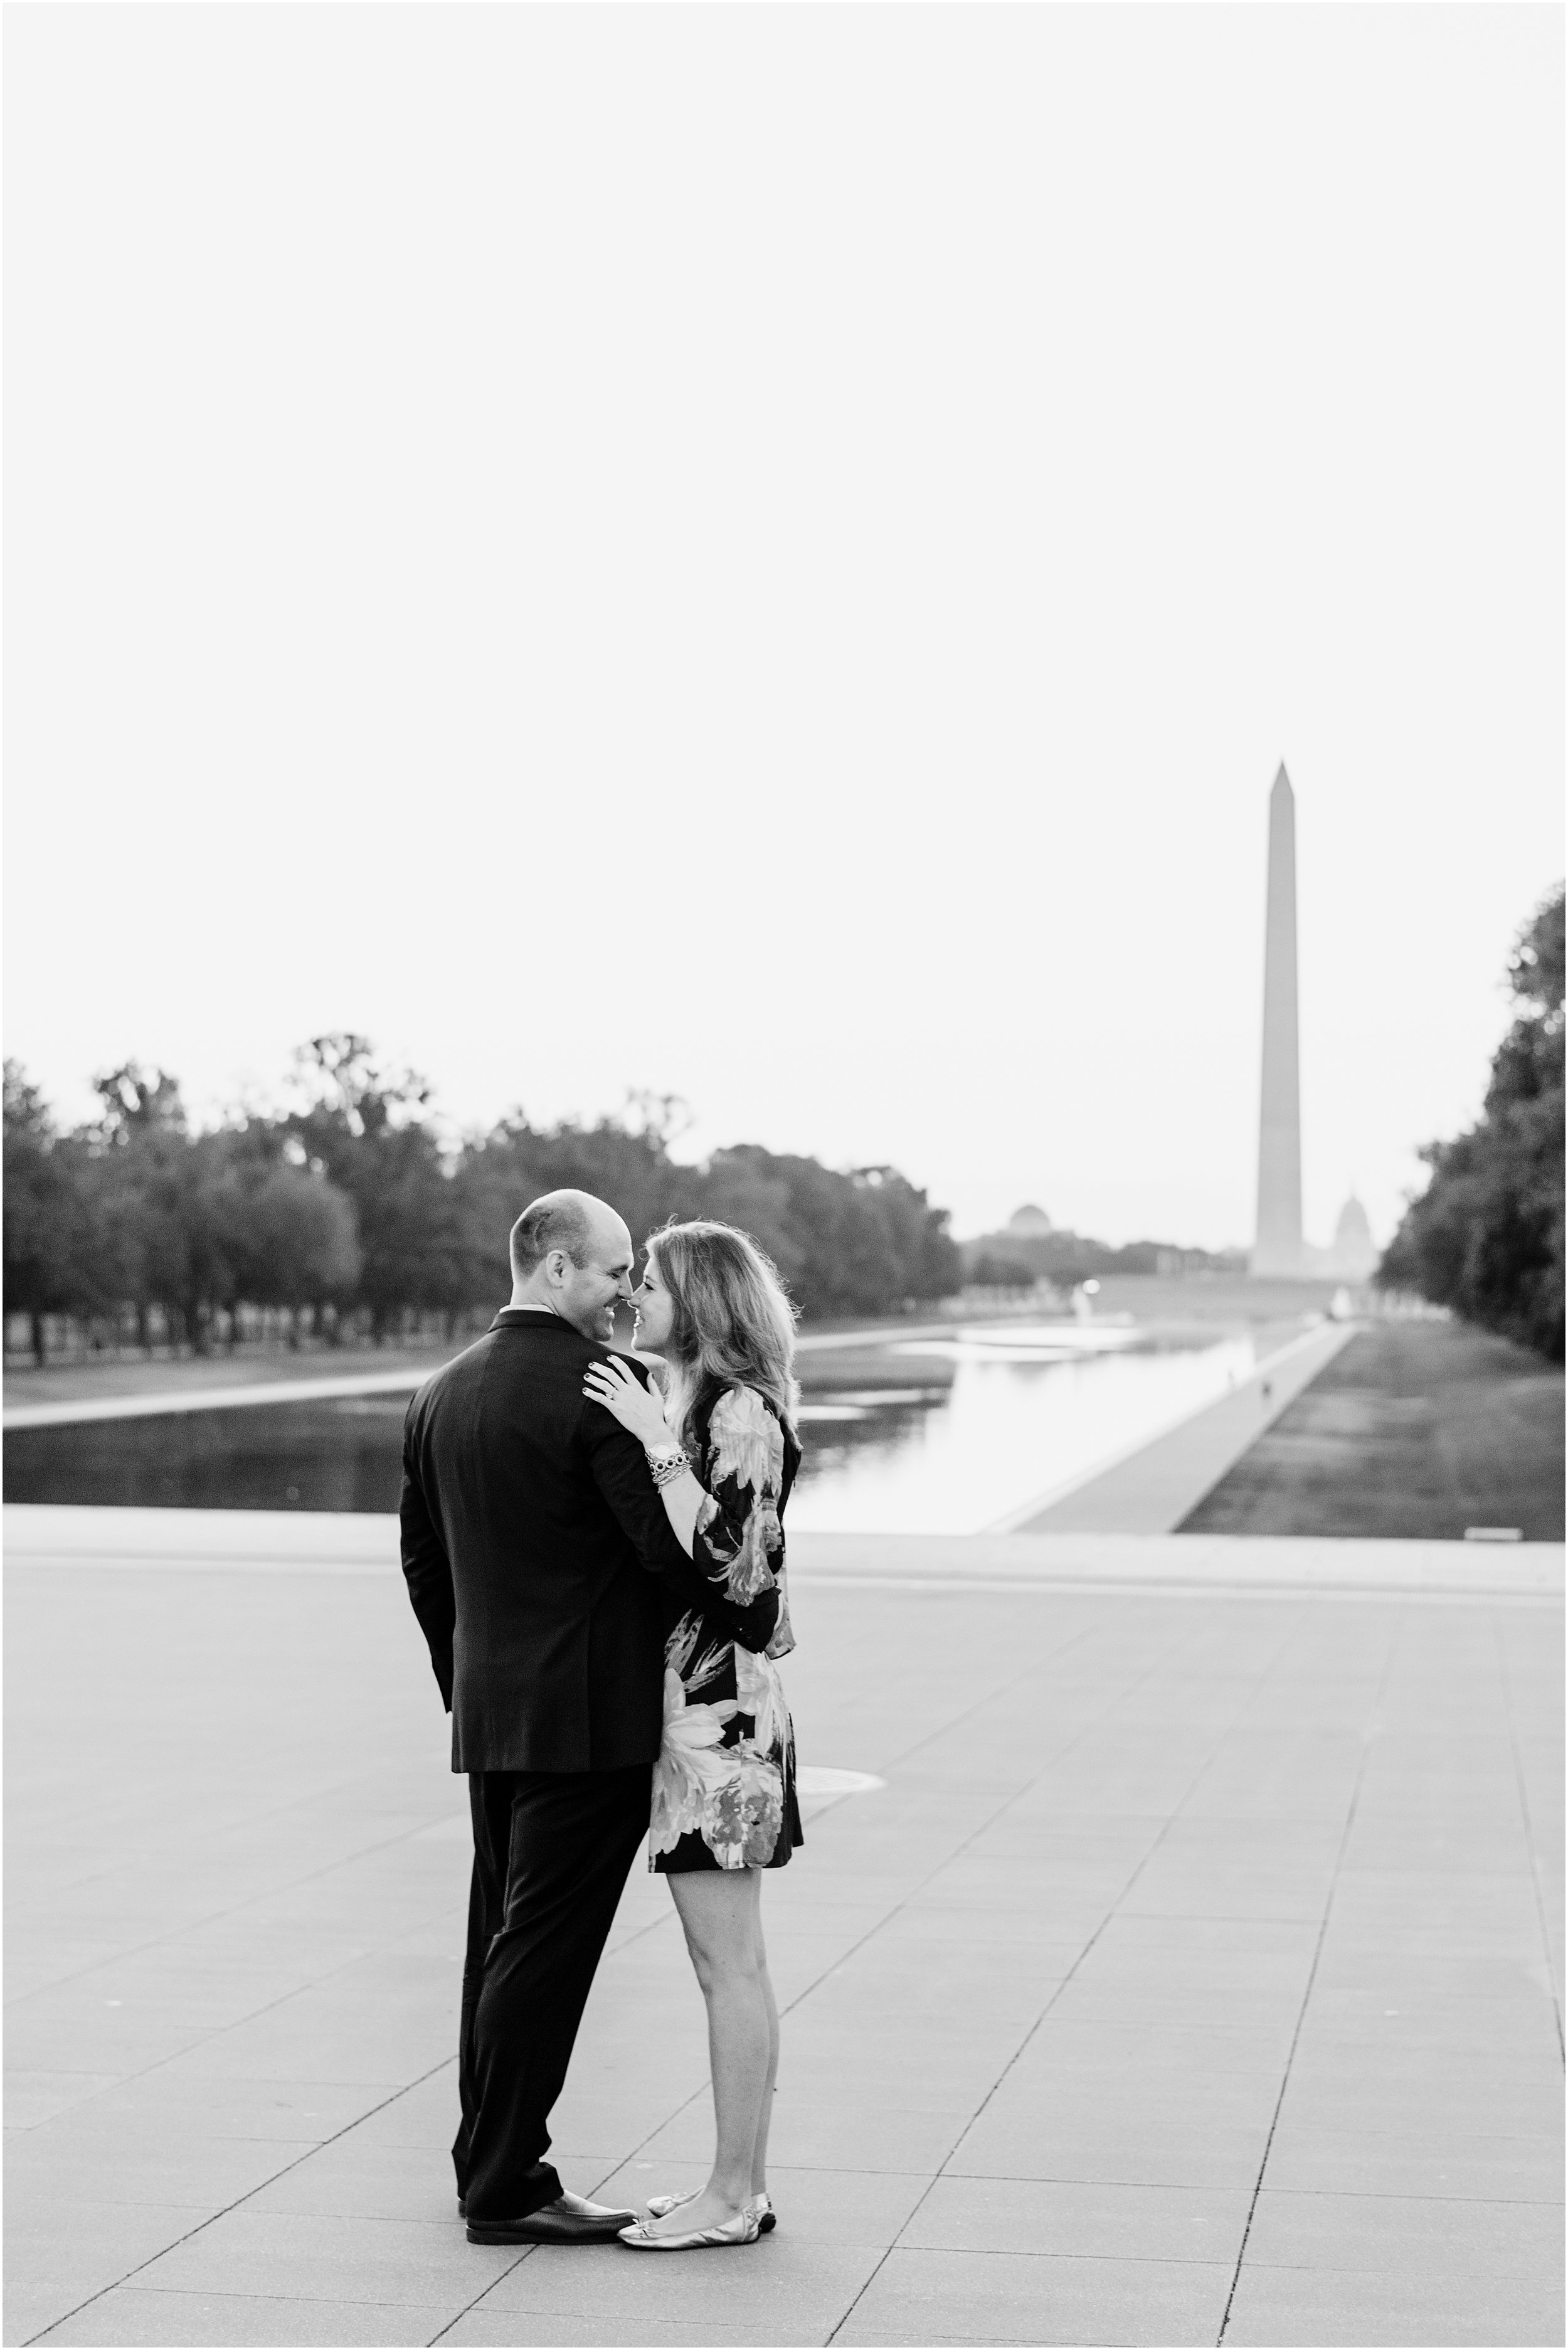 hannah leigh photography Sunrise Jefferson Memorial Engagement Session, Washington DC_1015.jpg